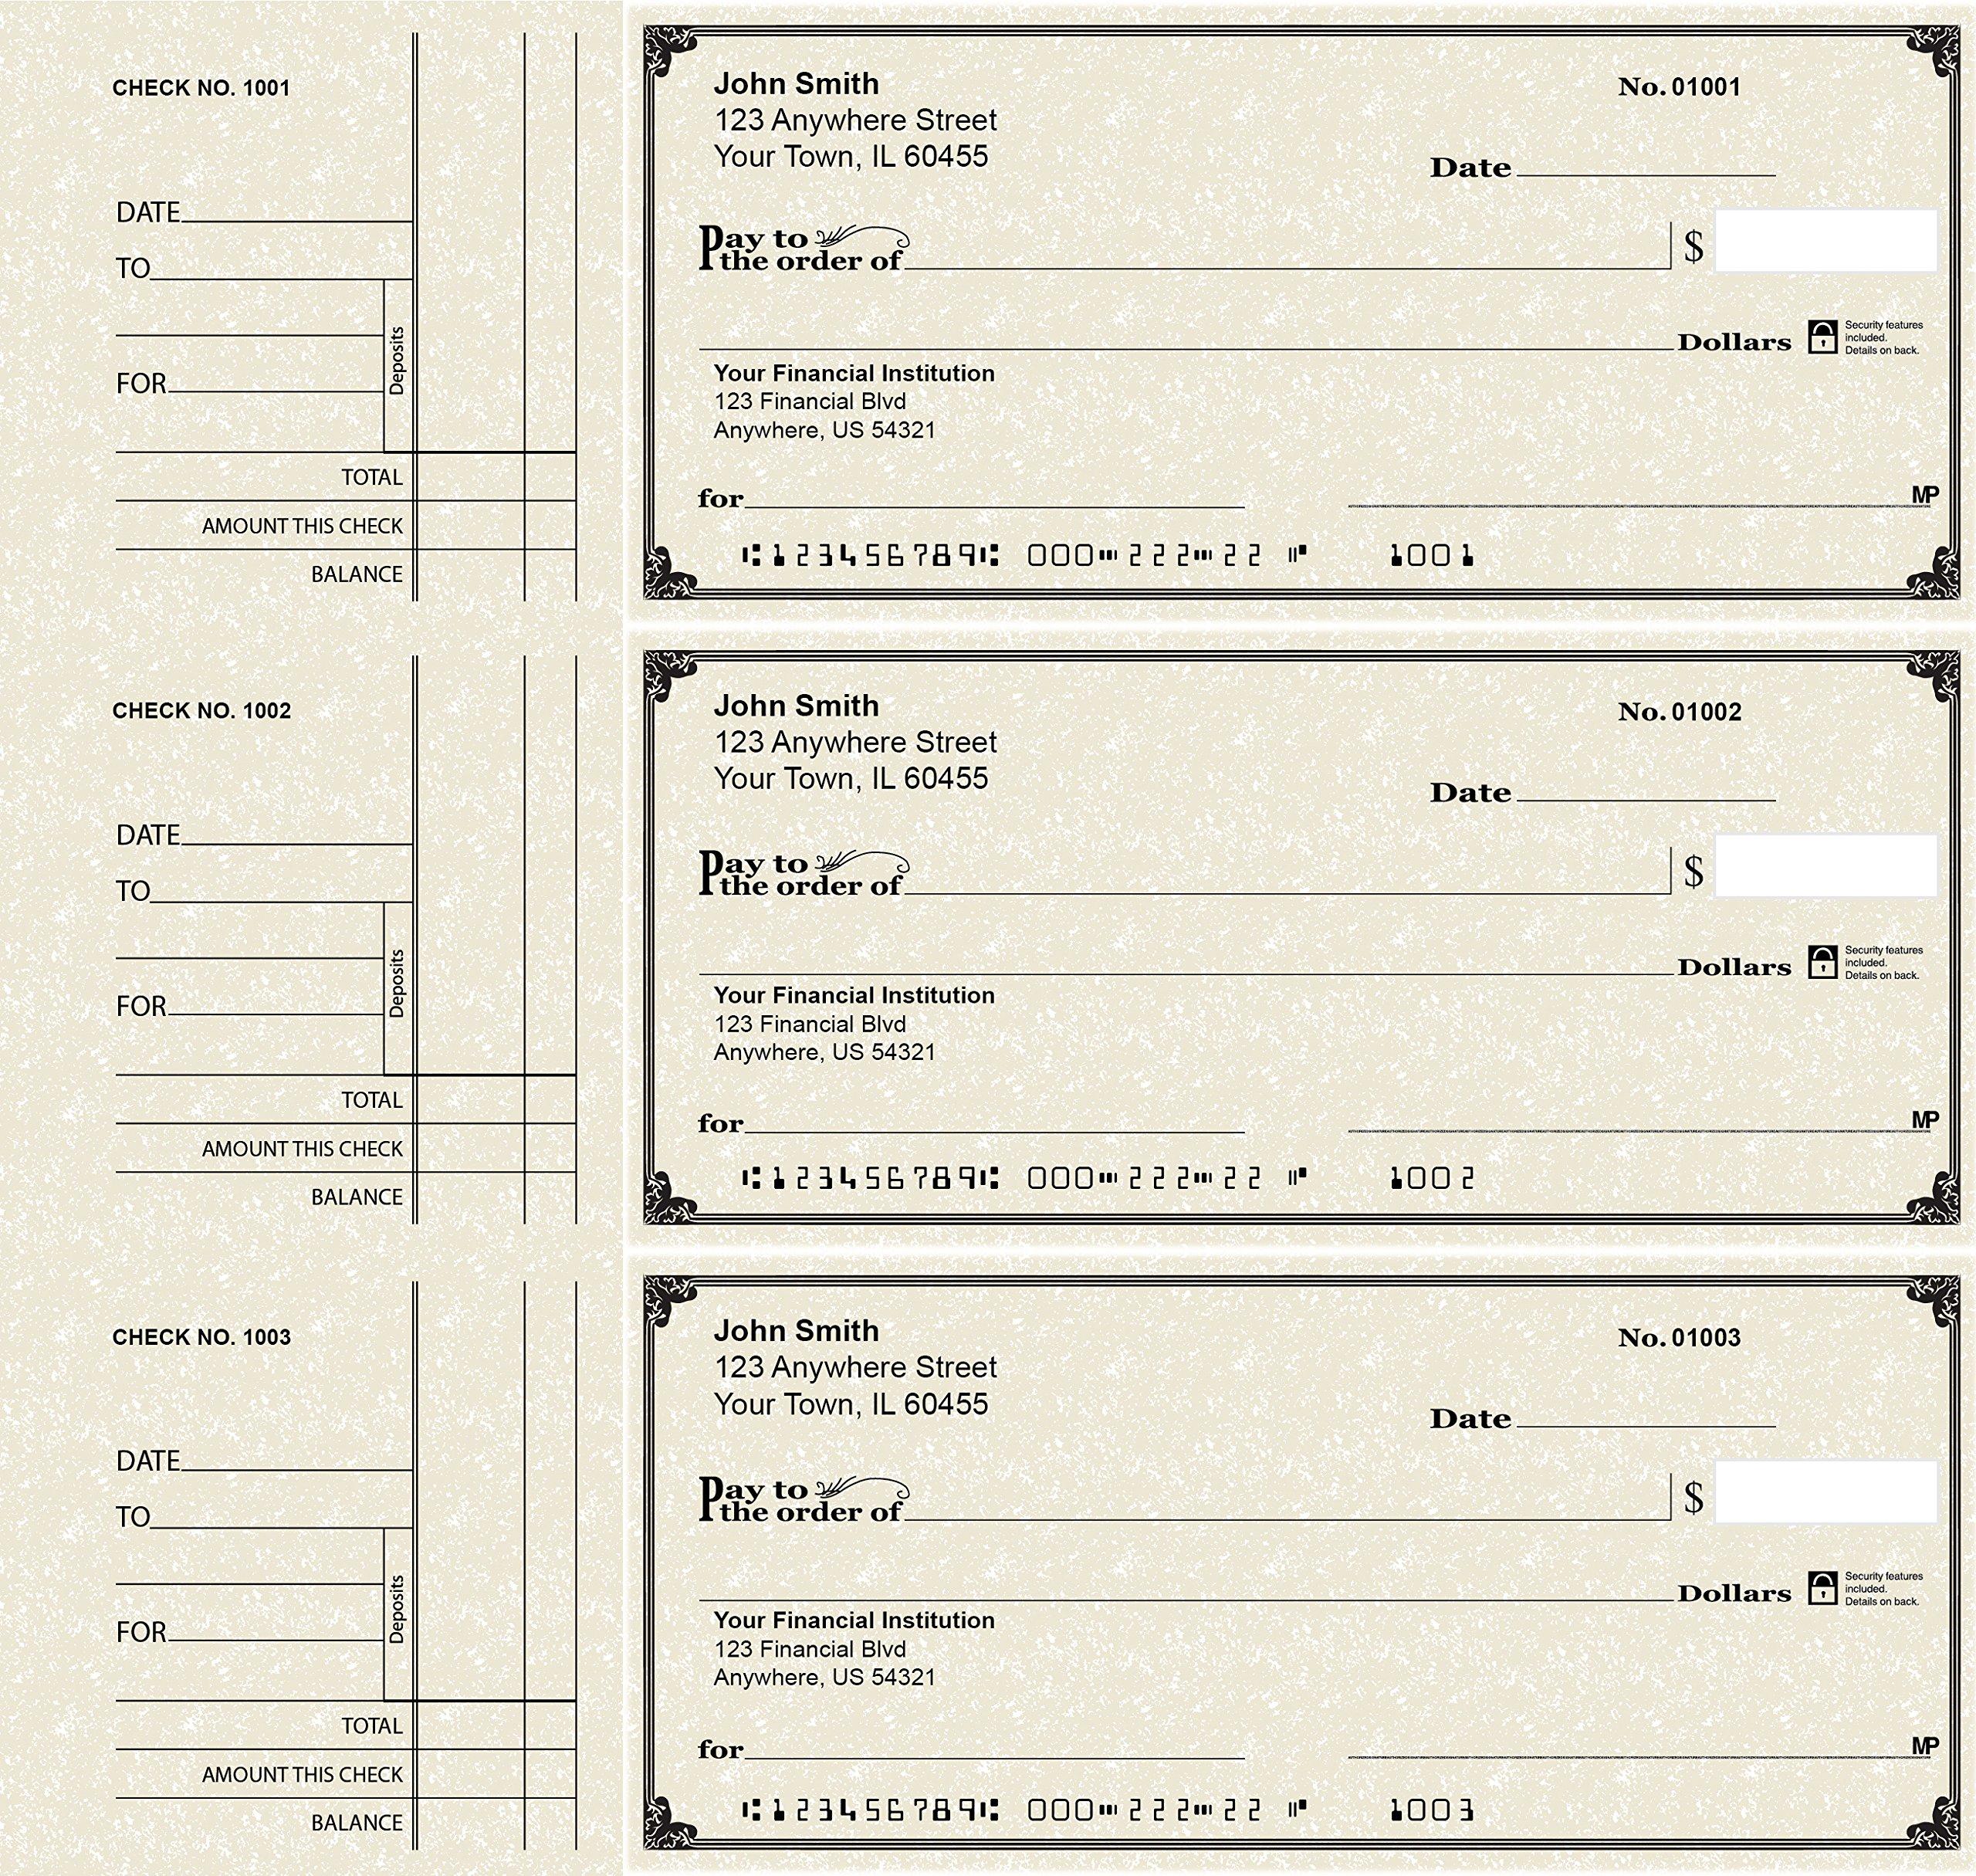 Deskset Personal Checks (300 Duplicate Checks, Parchment)